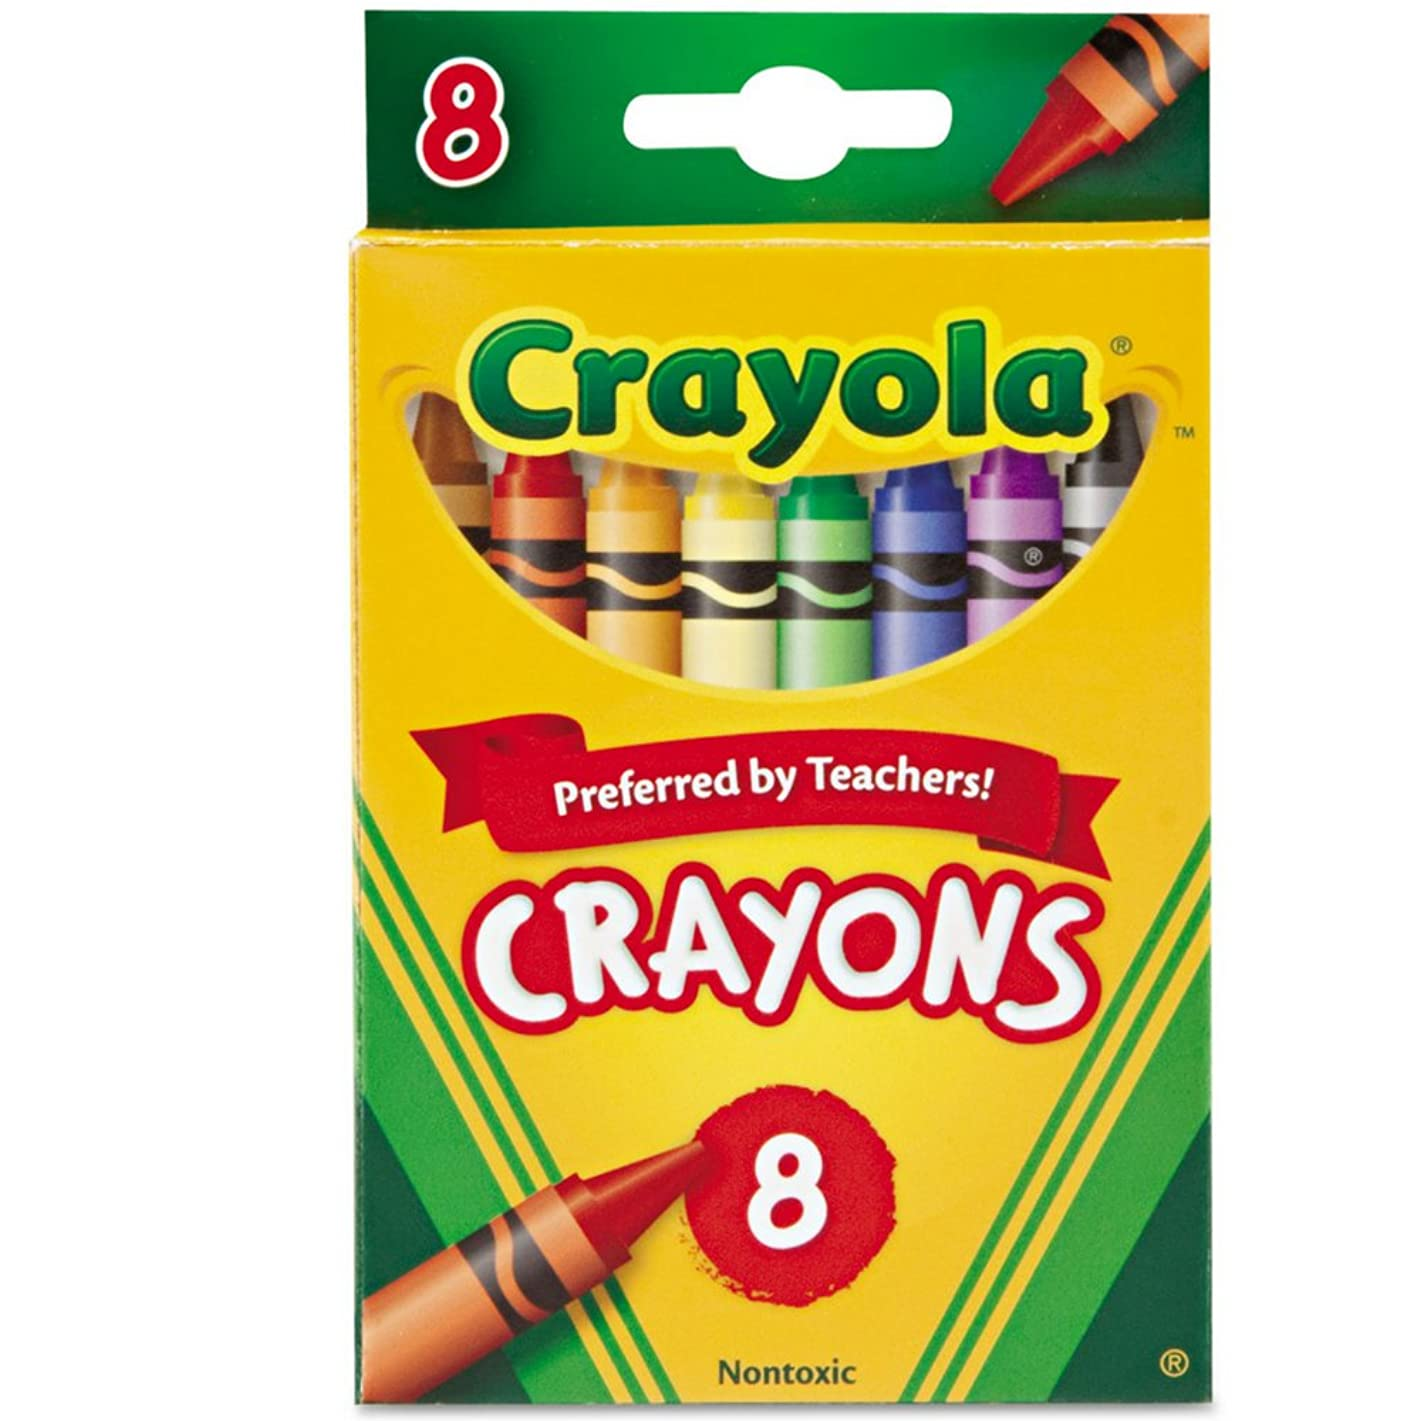 Crayola Crayons 8 Colors, 3 Pack